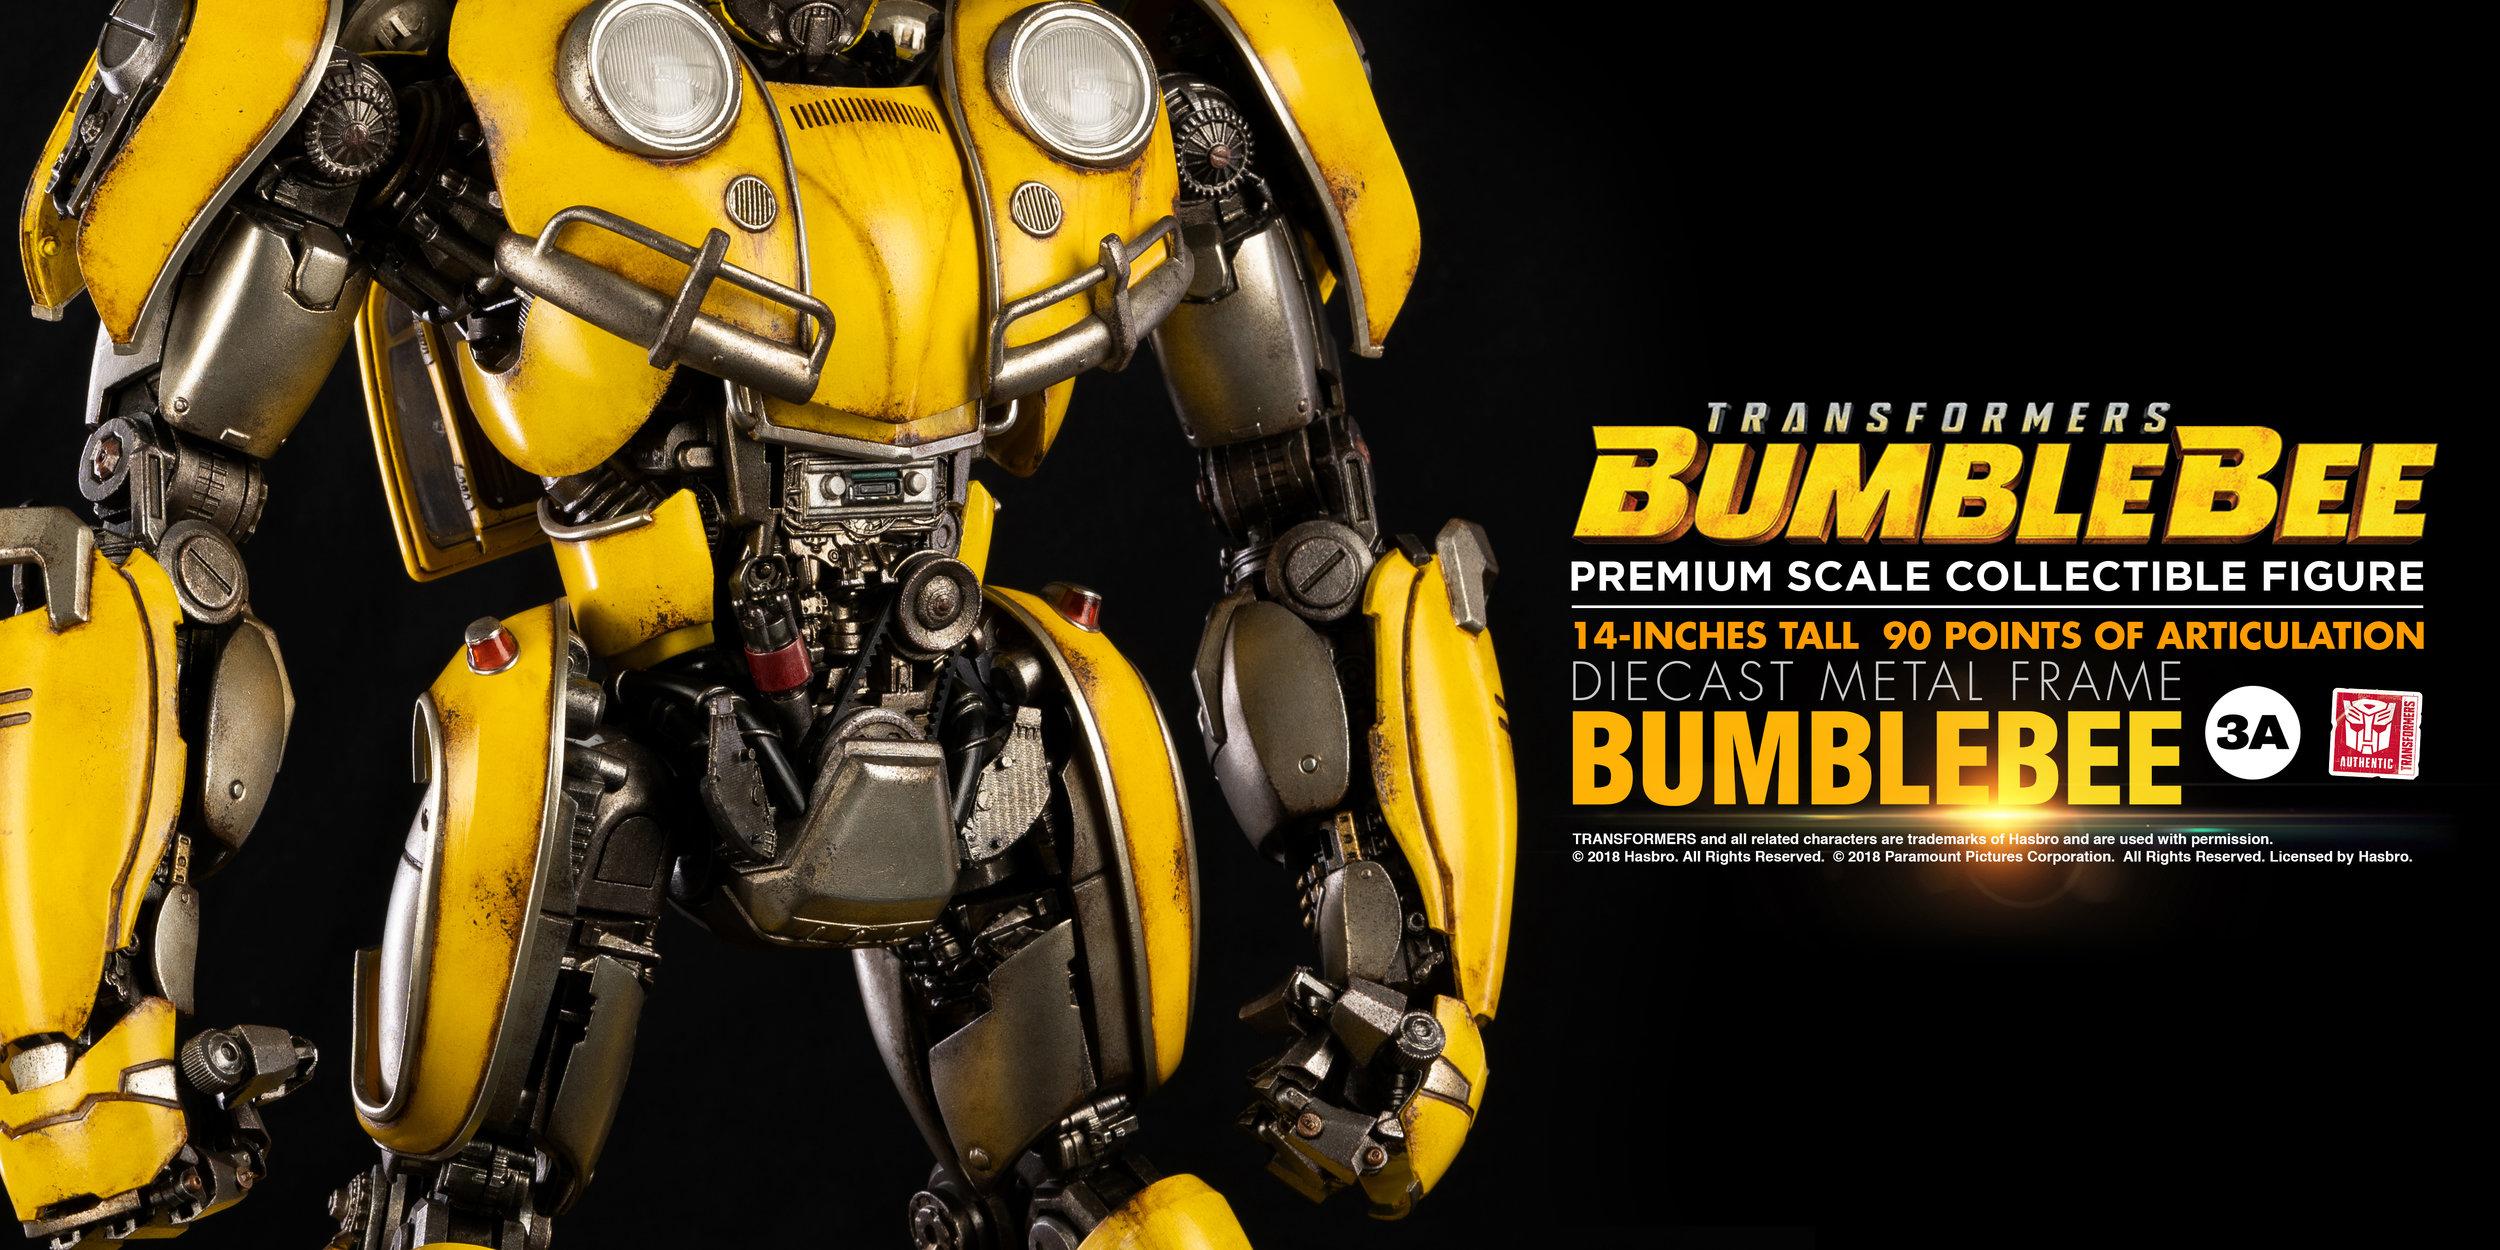 Bumblebee_ENG_PM_WIDE_009.jpg